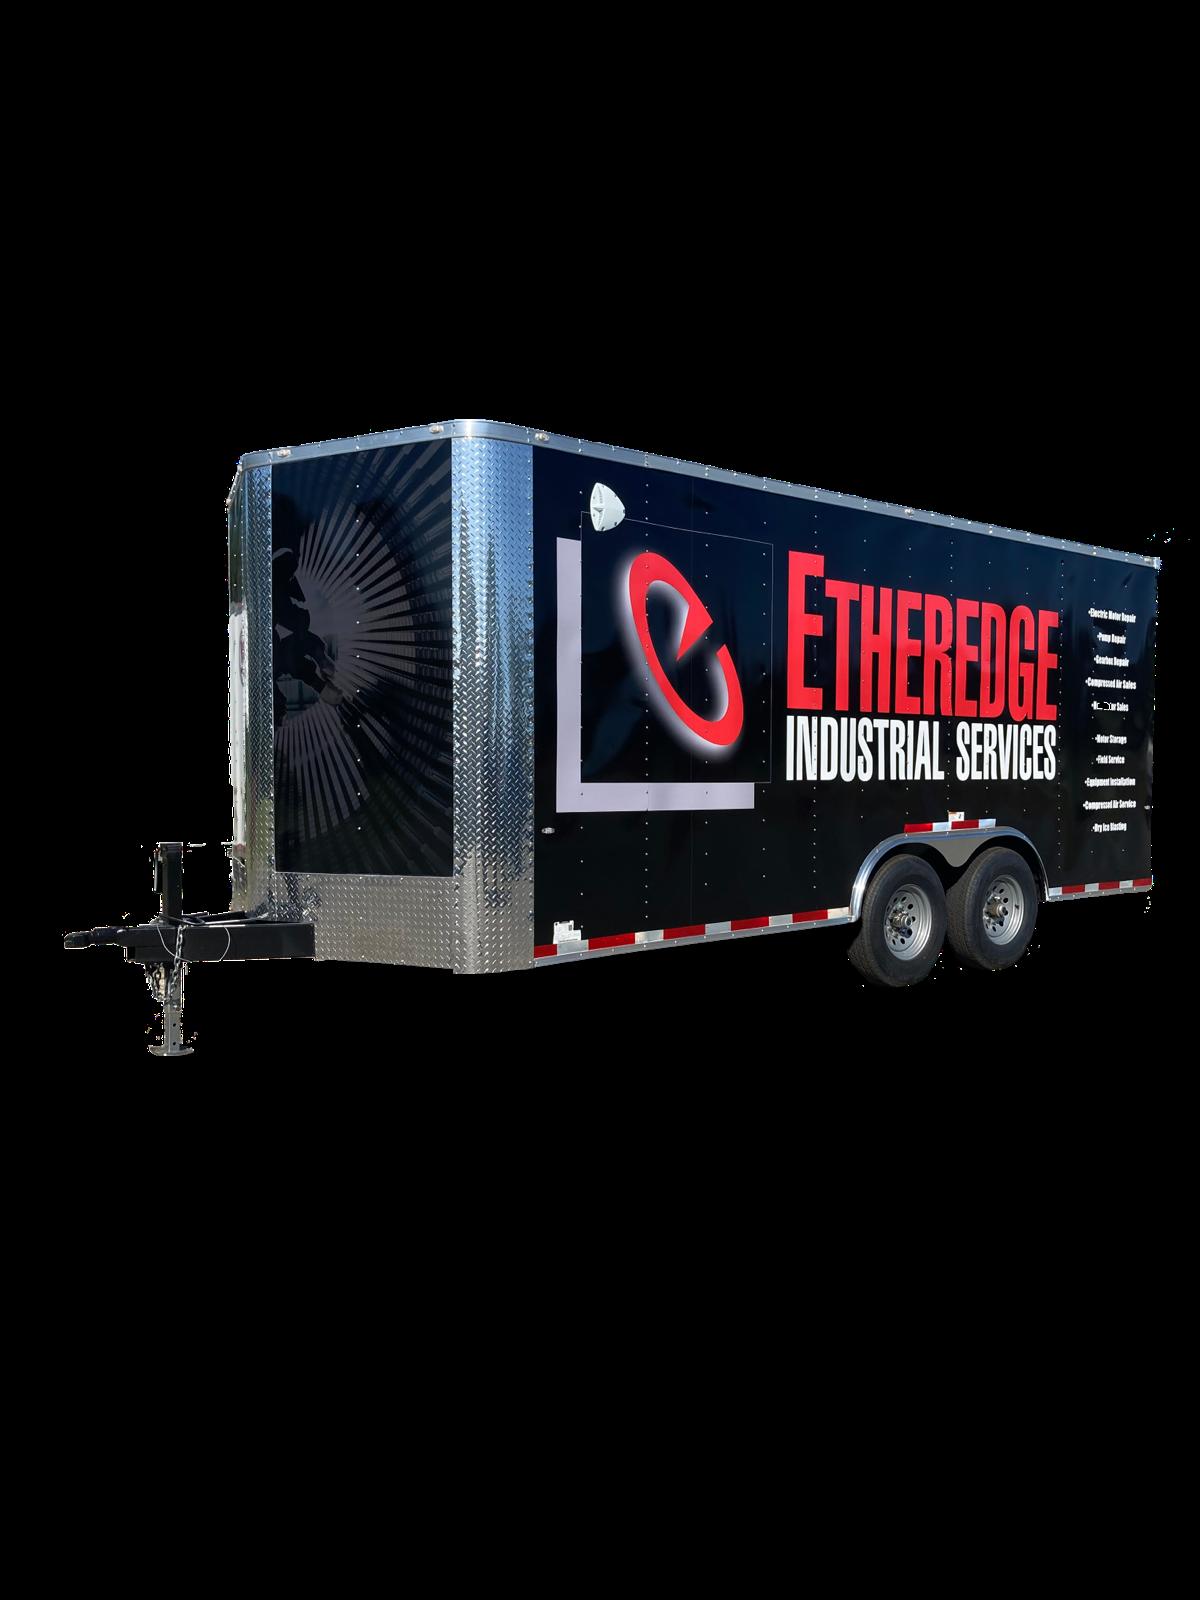 la electric company